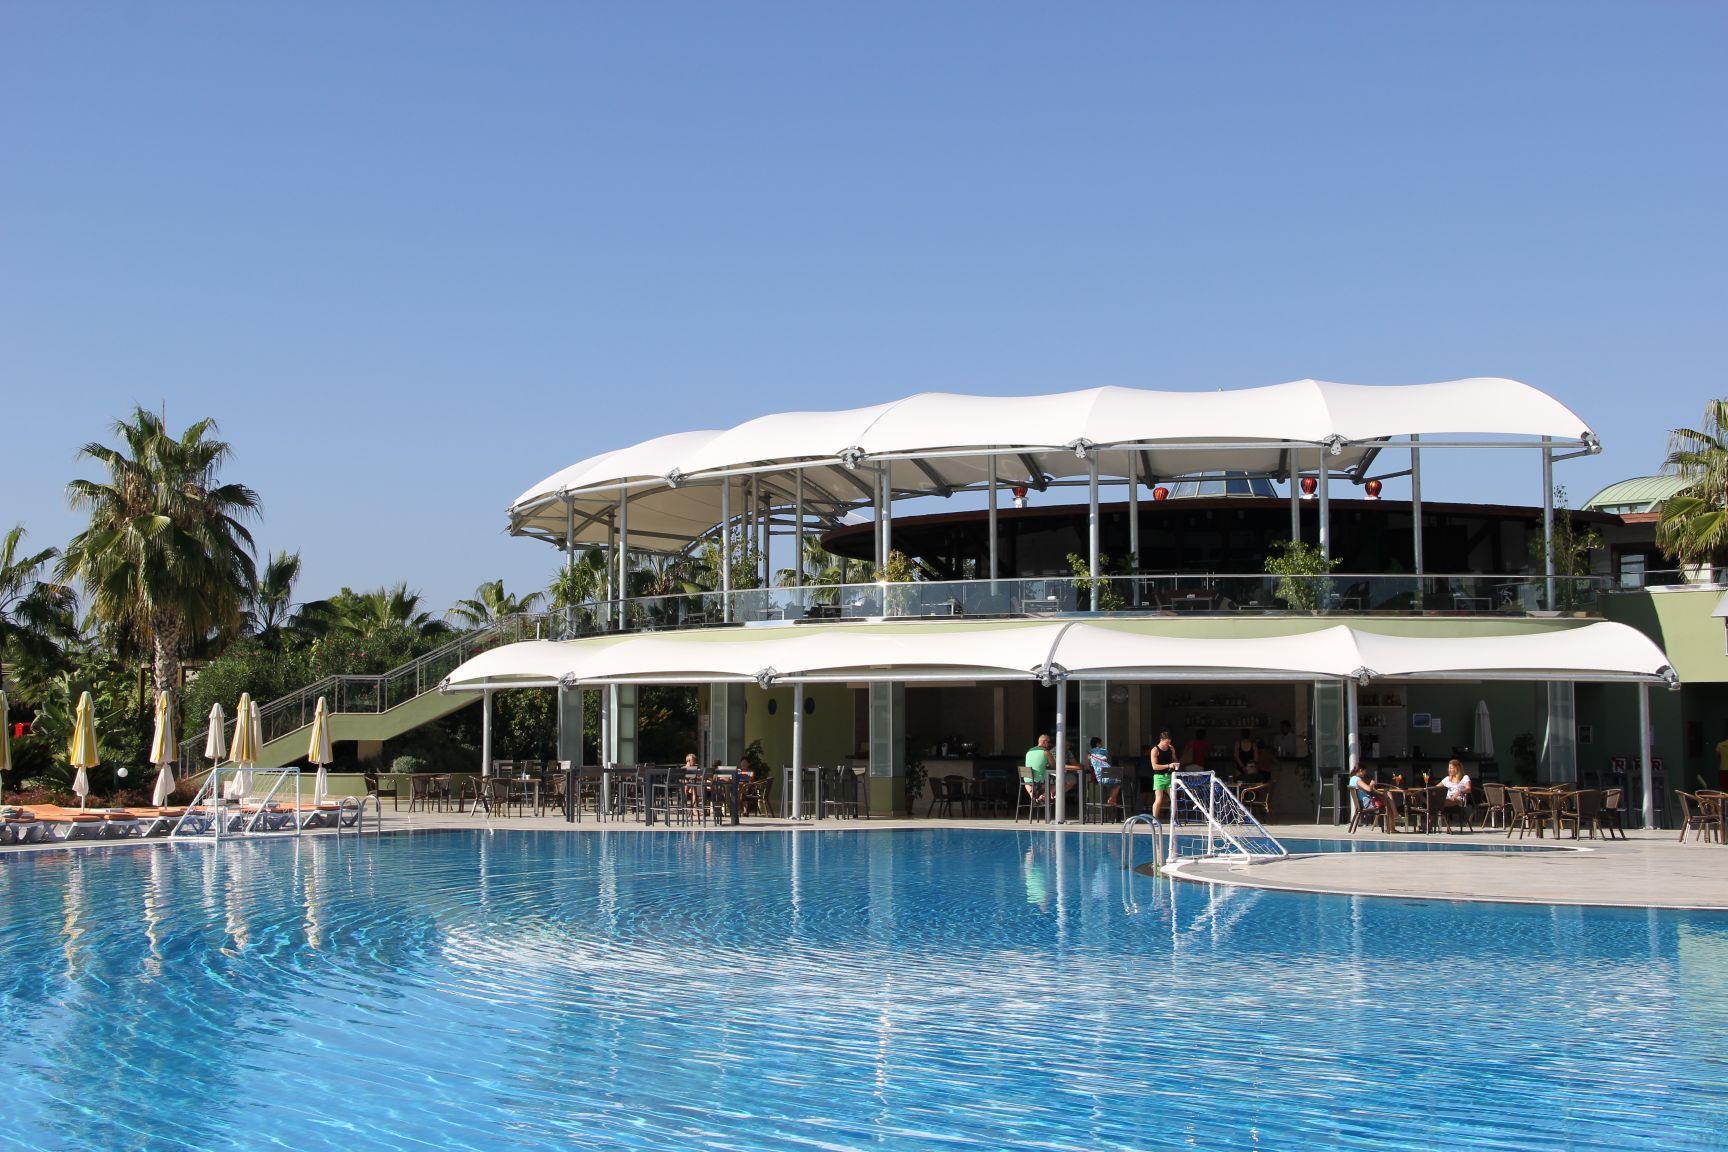 http://www.orextravel.sk/OREX/hotelphotos/vonresort-golden-coast-general-0015.jpg